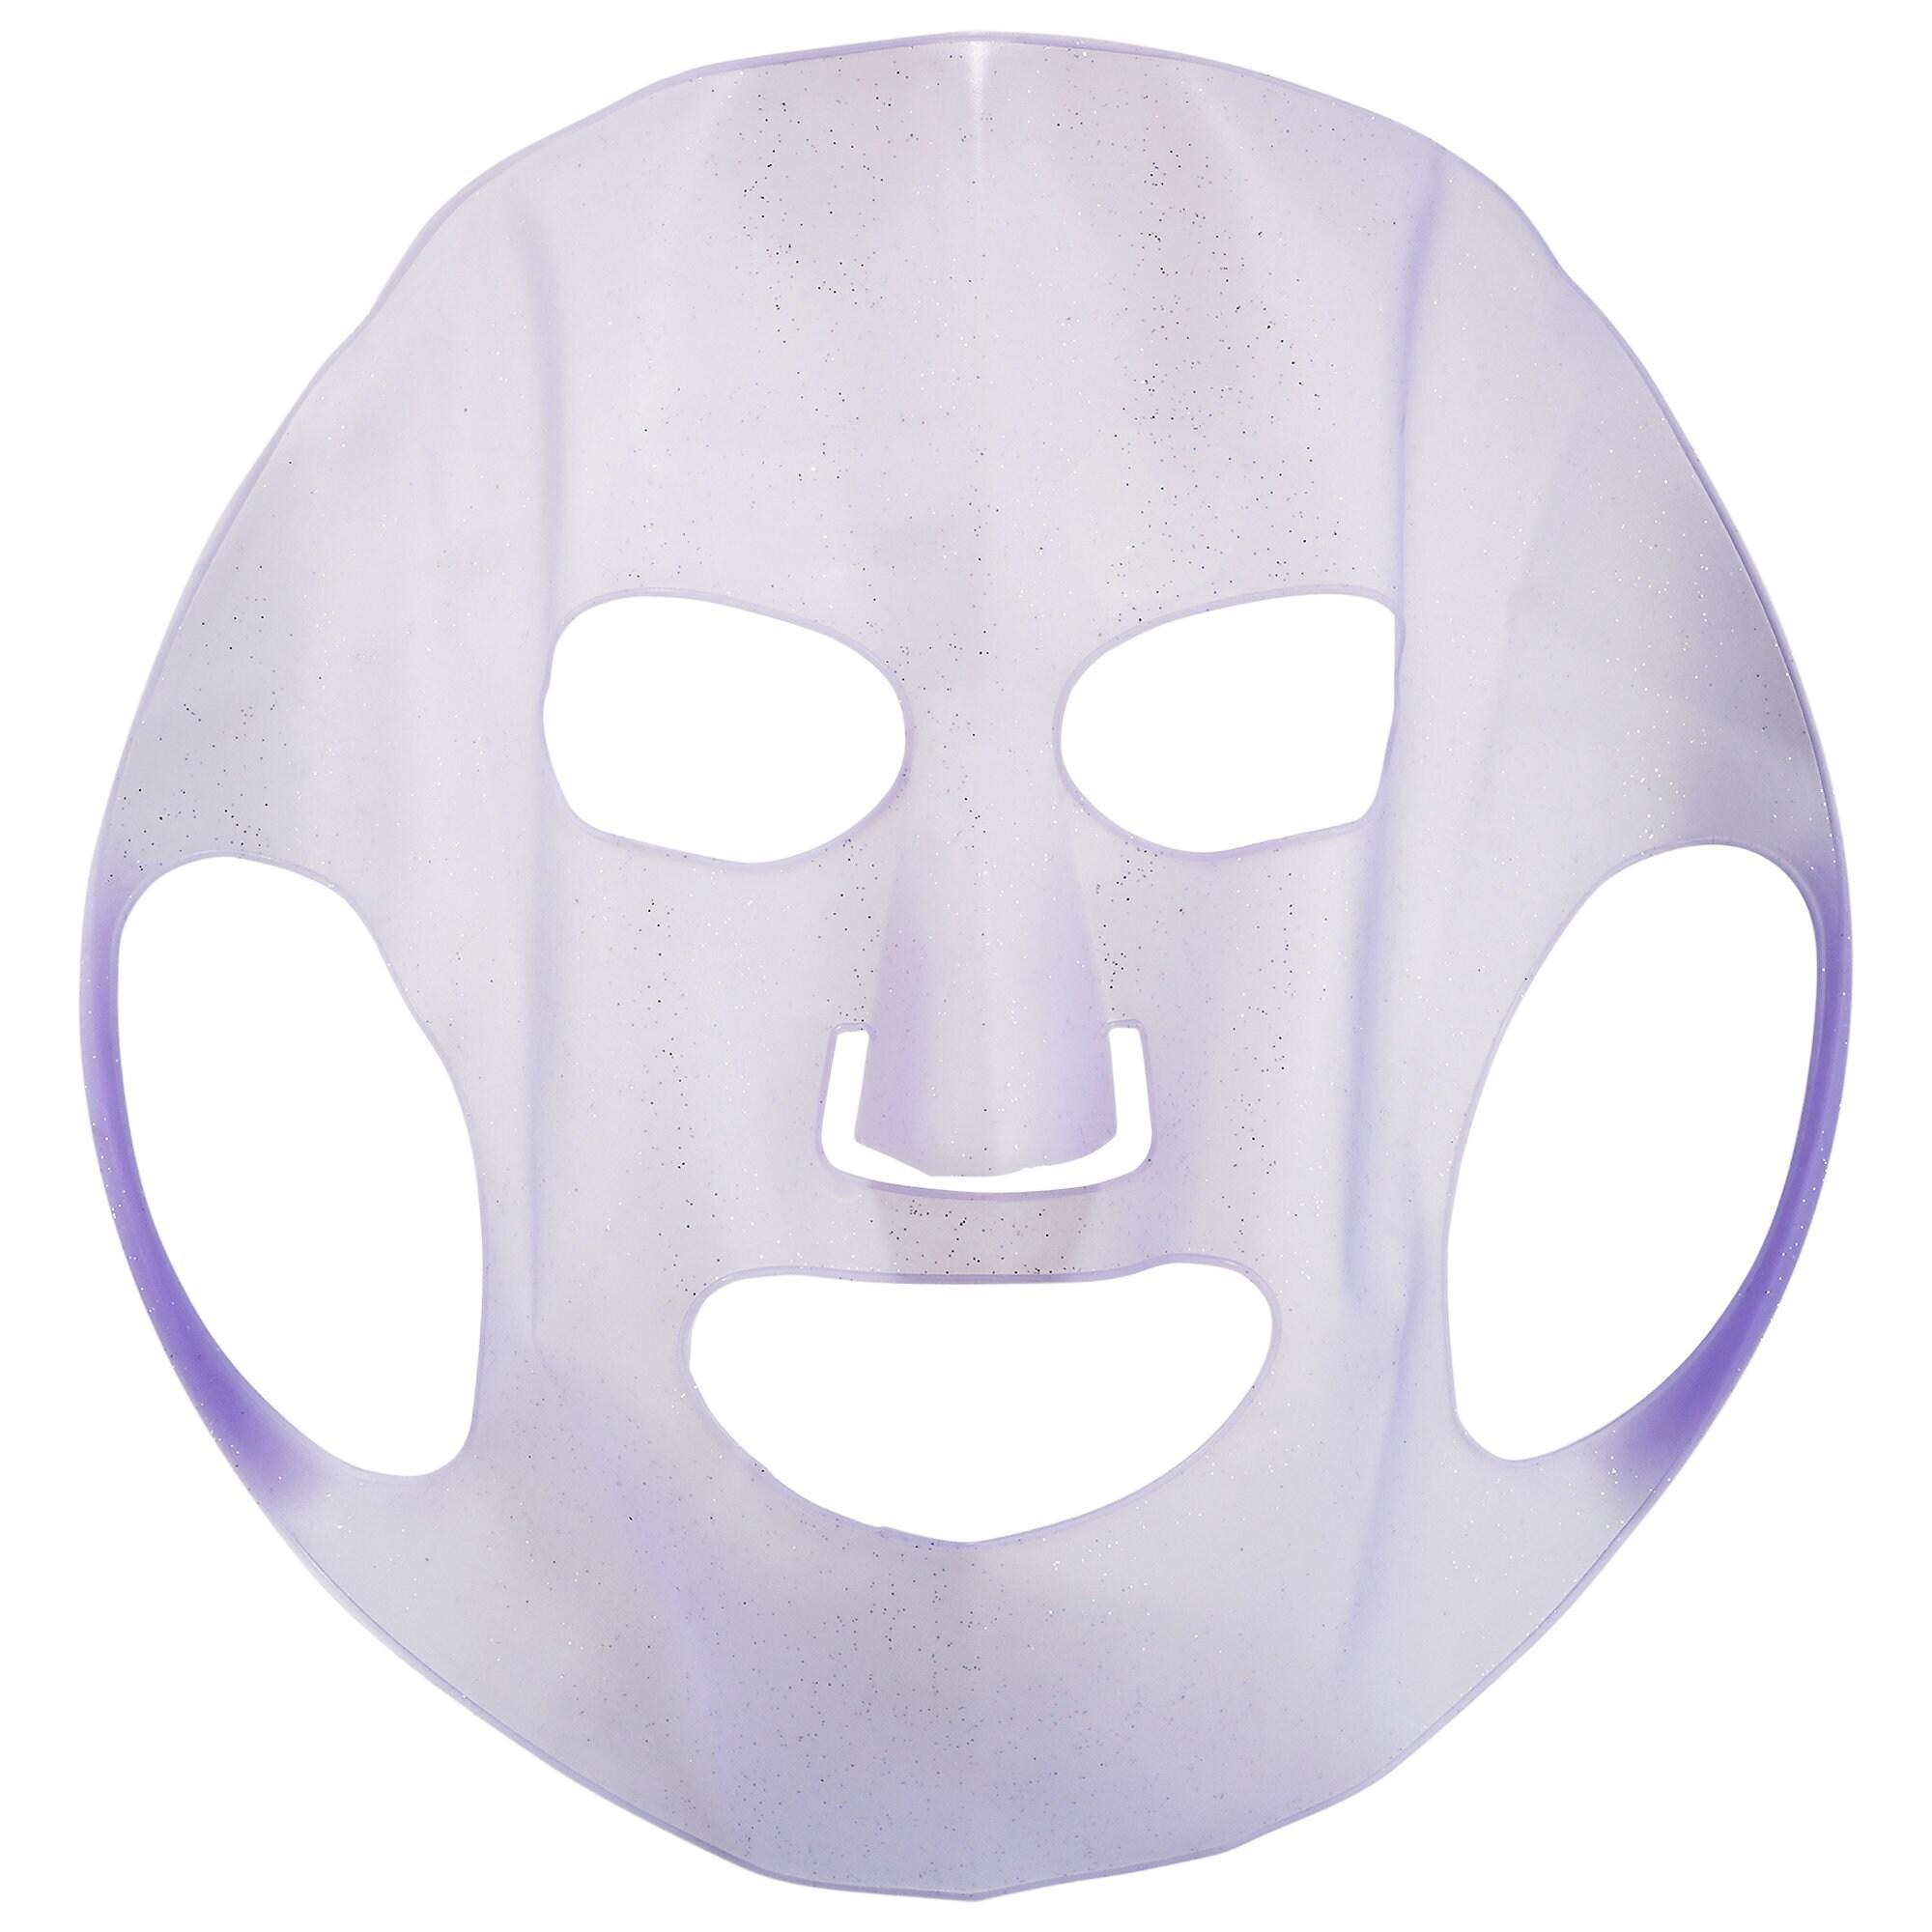 Sephora Collection Keep on Masking Face Mask Holder